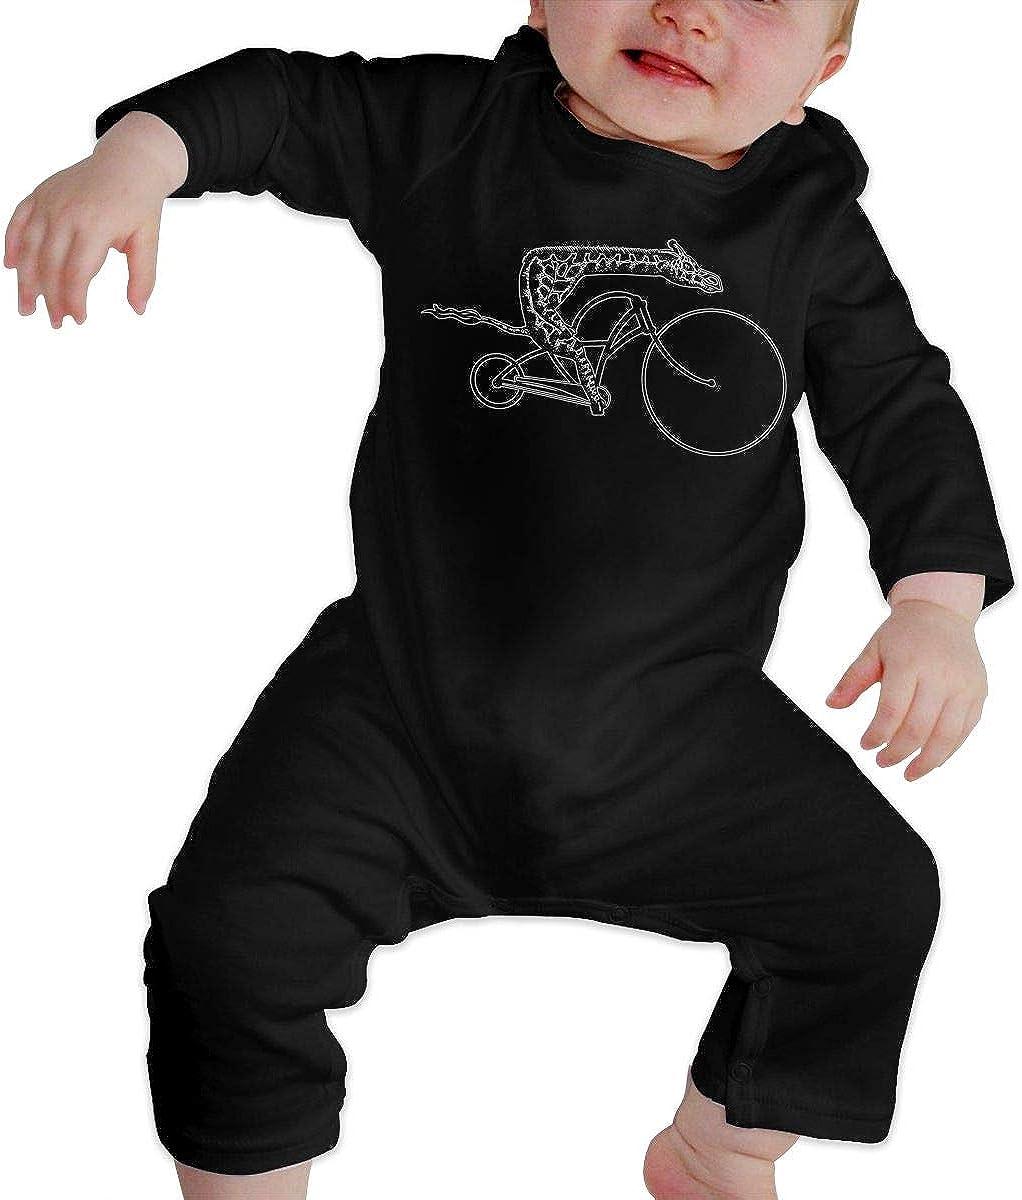 Giraffe On A Bike Printed Boys Girls Bodysuit Long Sleeve Pajamas Black